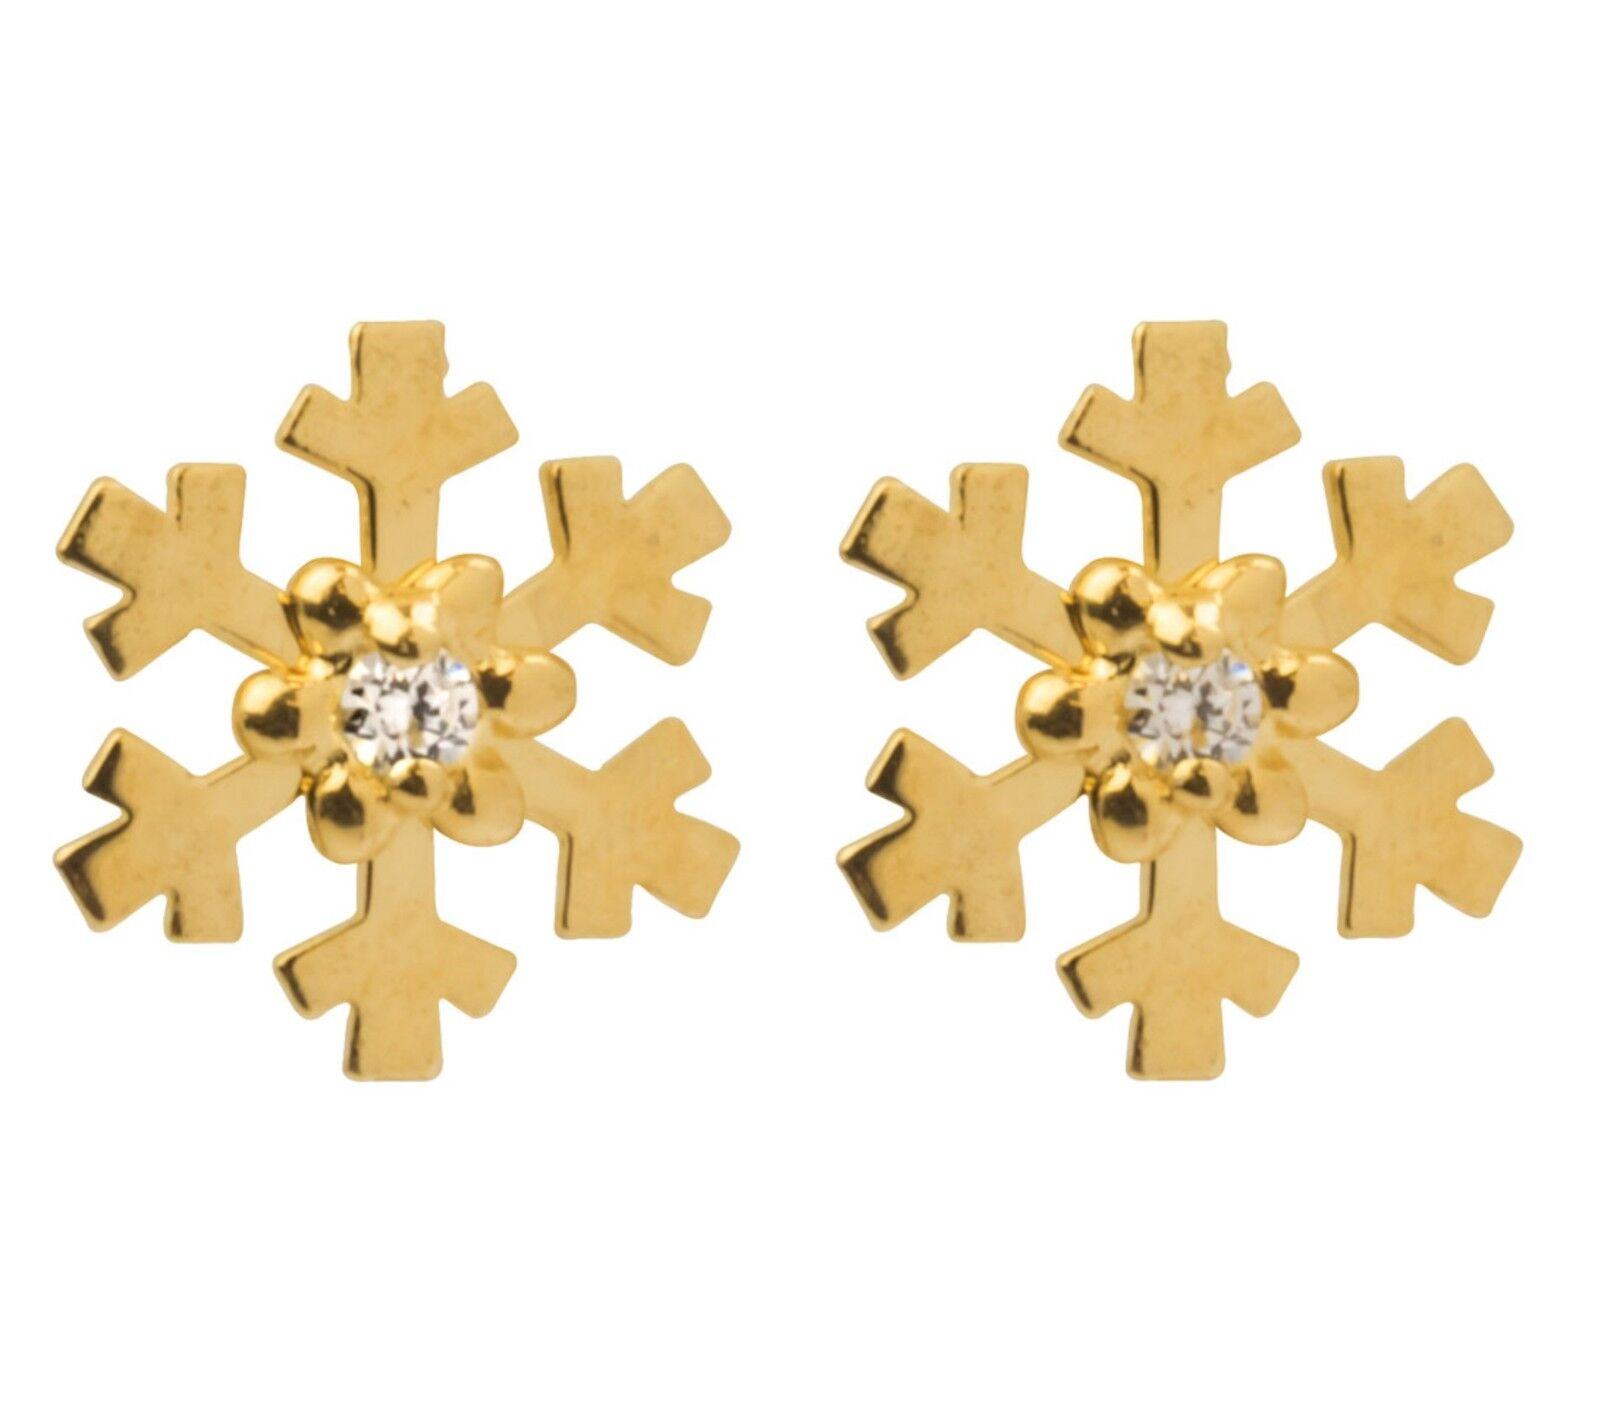 9ct Yellow gold Snowflake CZ Gem Set Ear Studs Earrings + gift bag